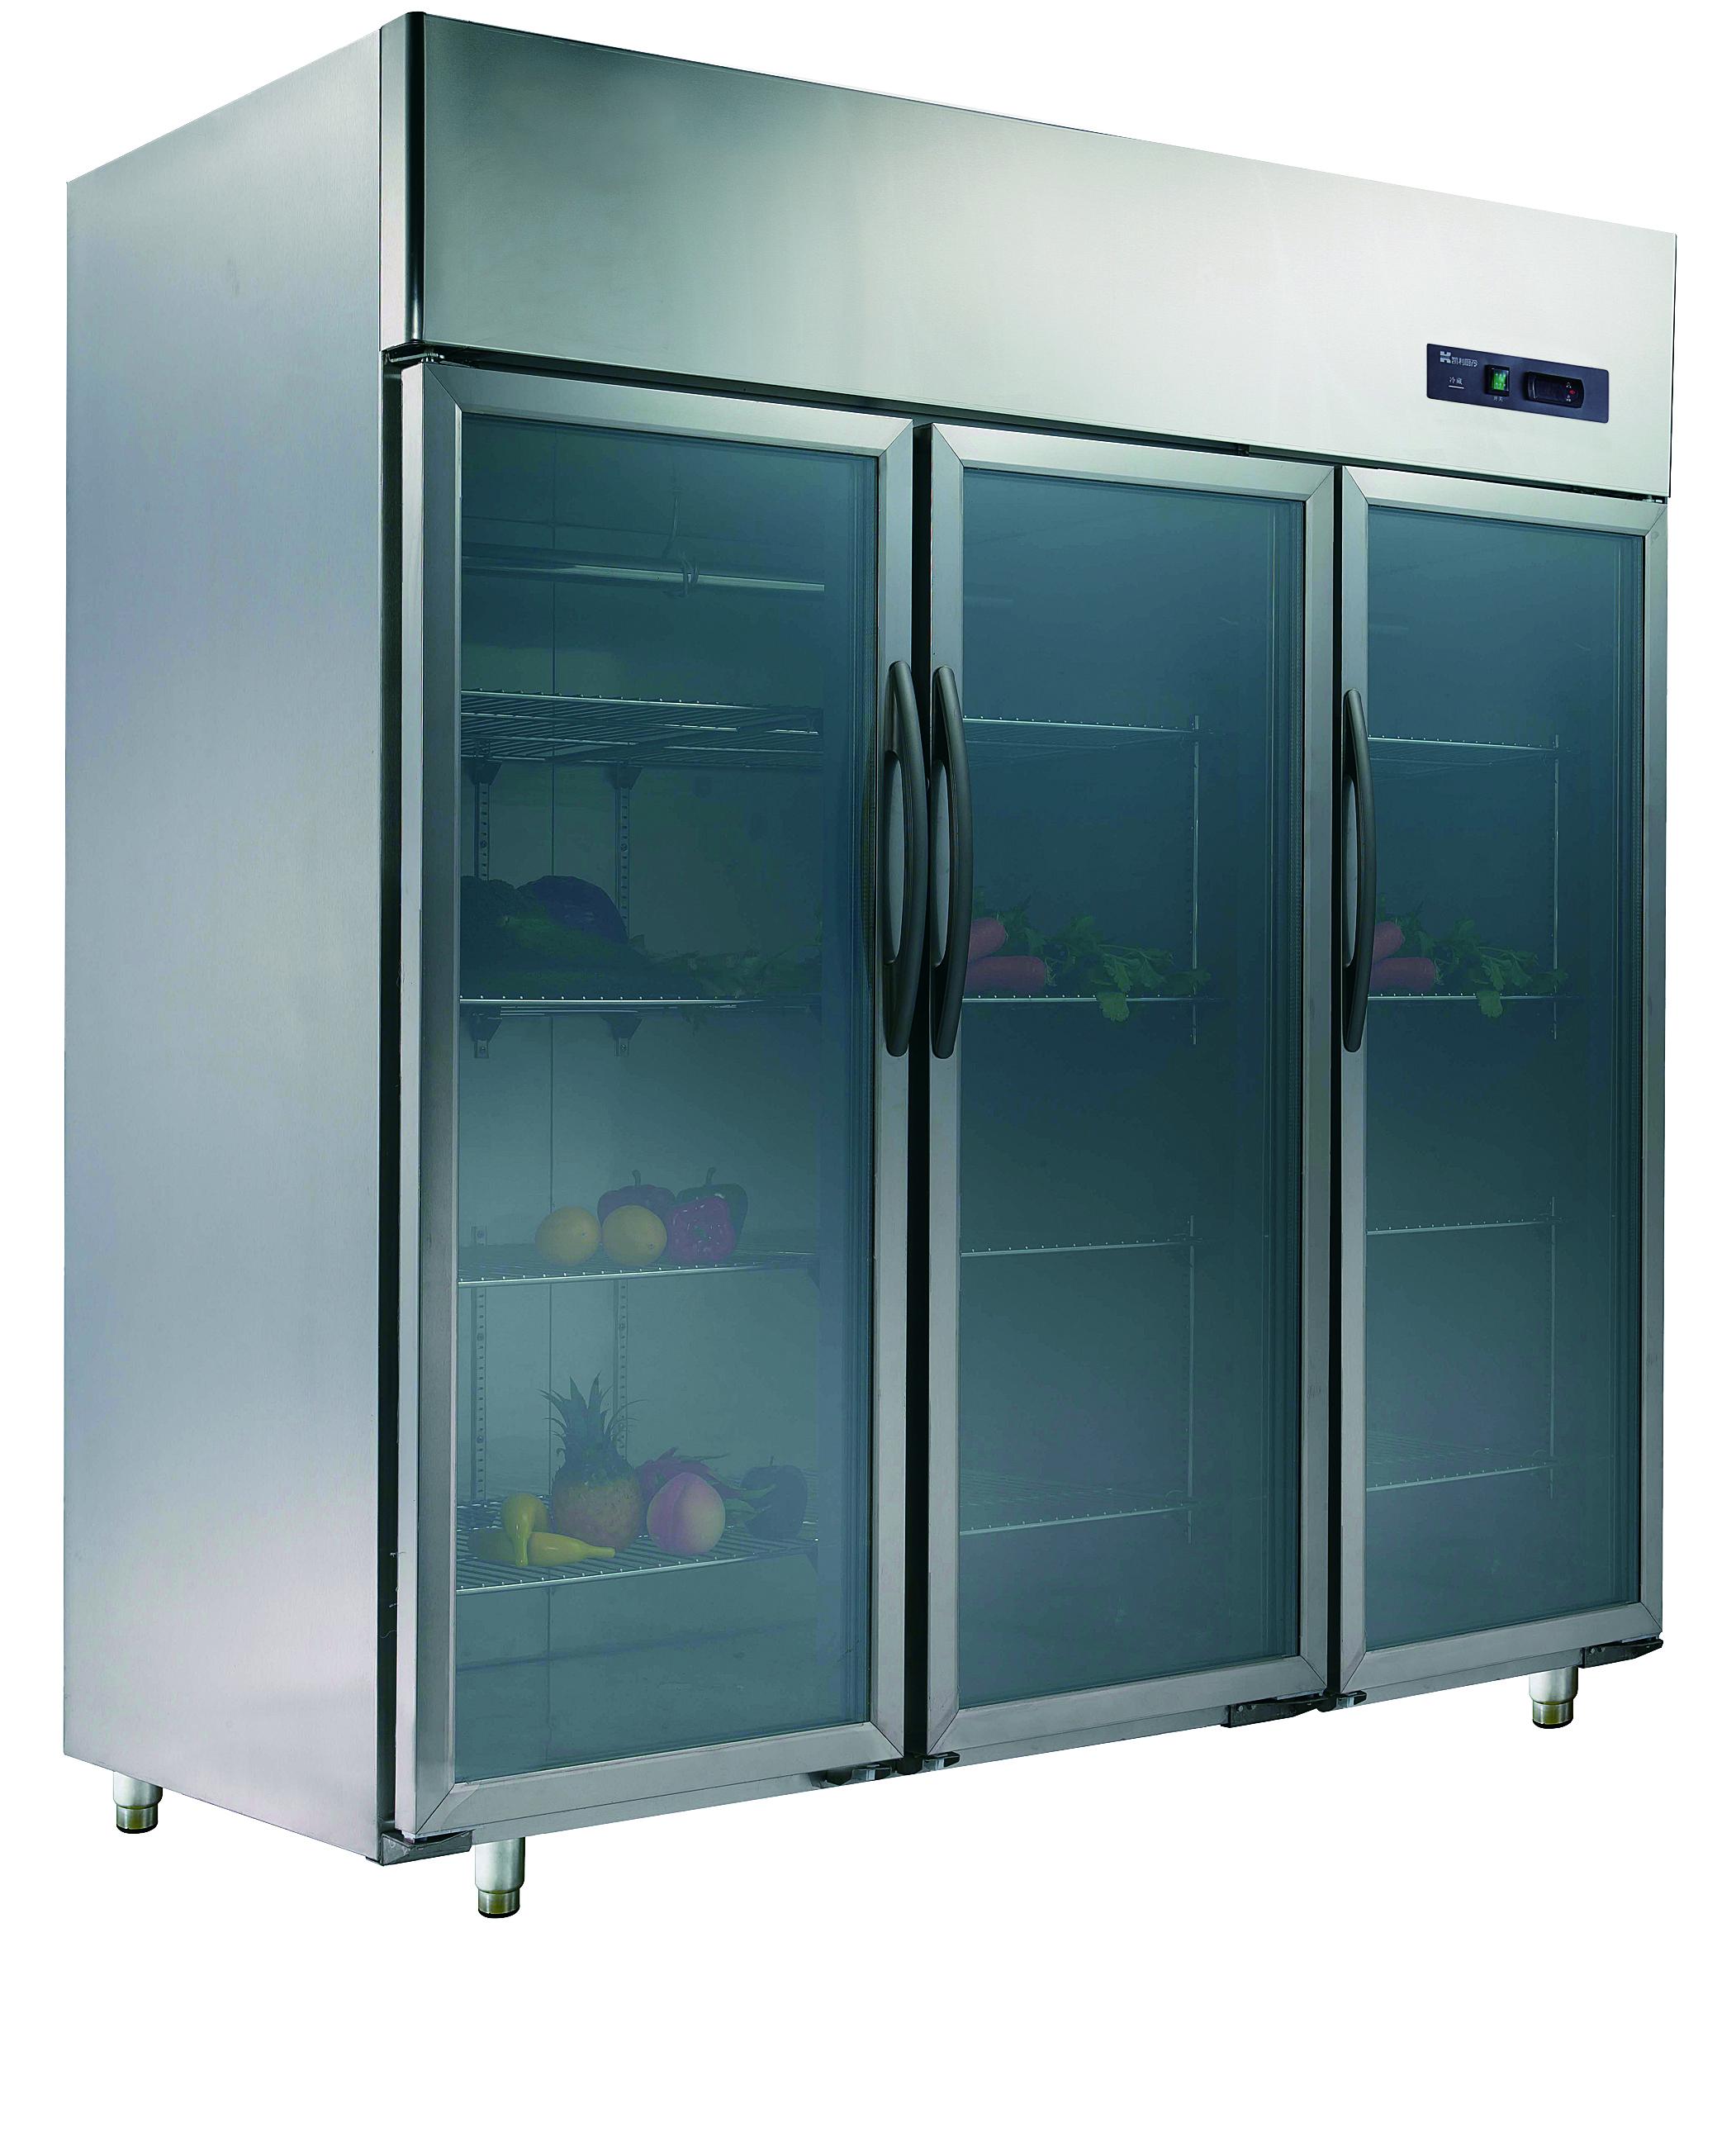 Hangzhou Kalifon Stainless Steel Kitchen Equipment Co. Ltd - Abraa